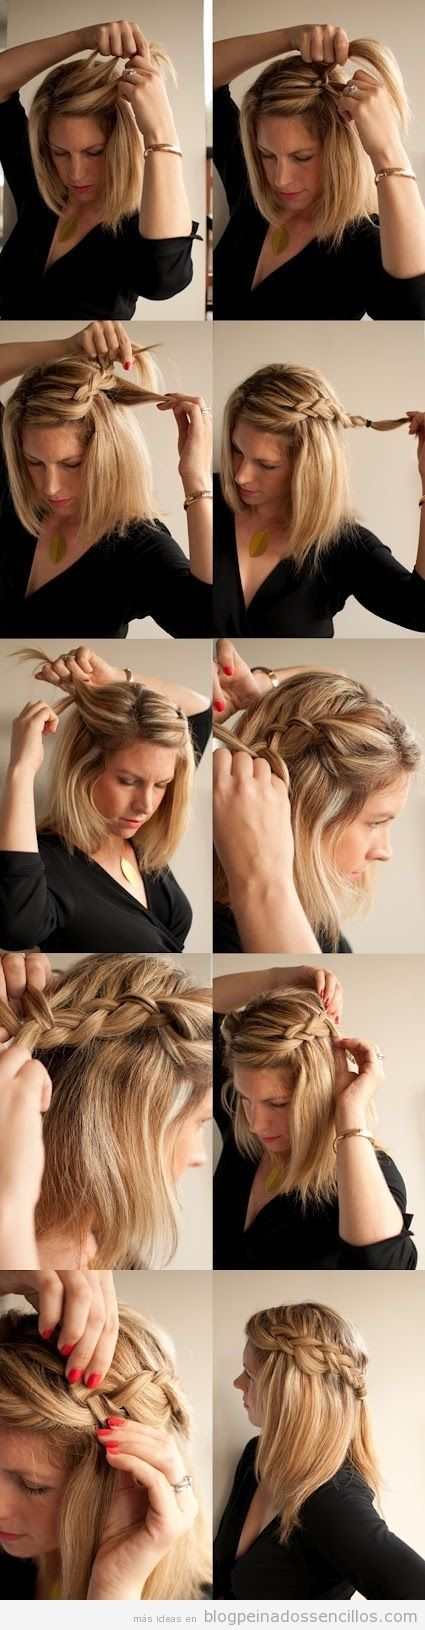 Tutorial peinado sencillo para diario: semirrecogido con trenzas